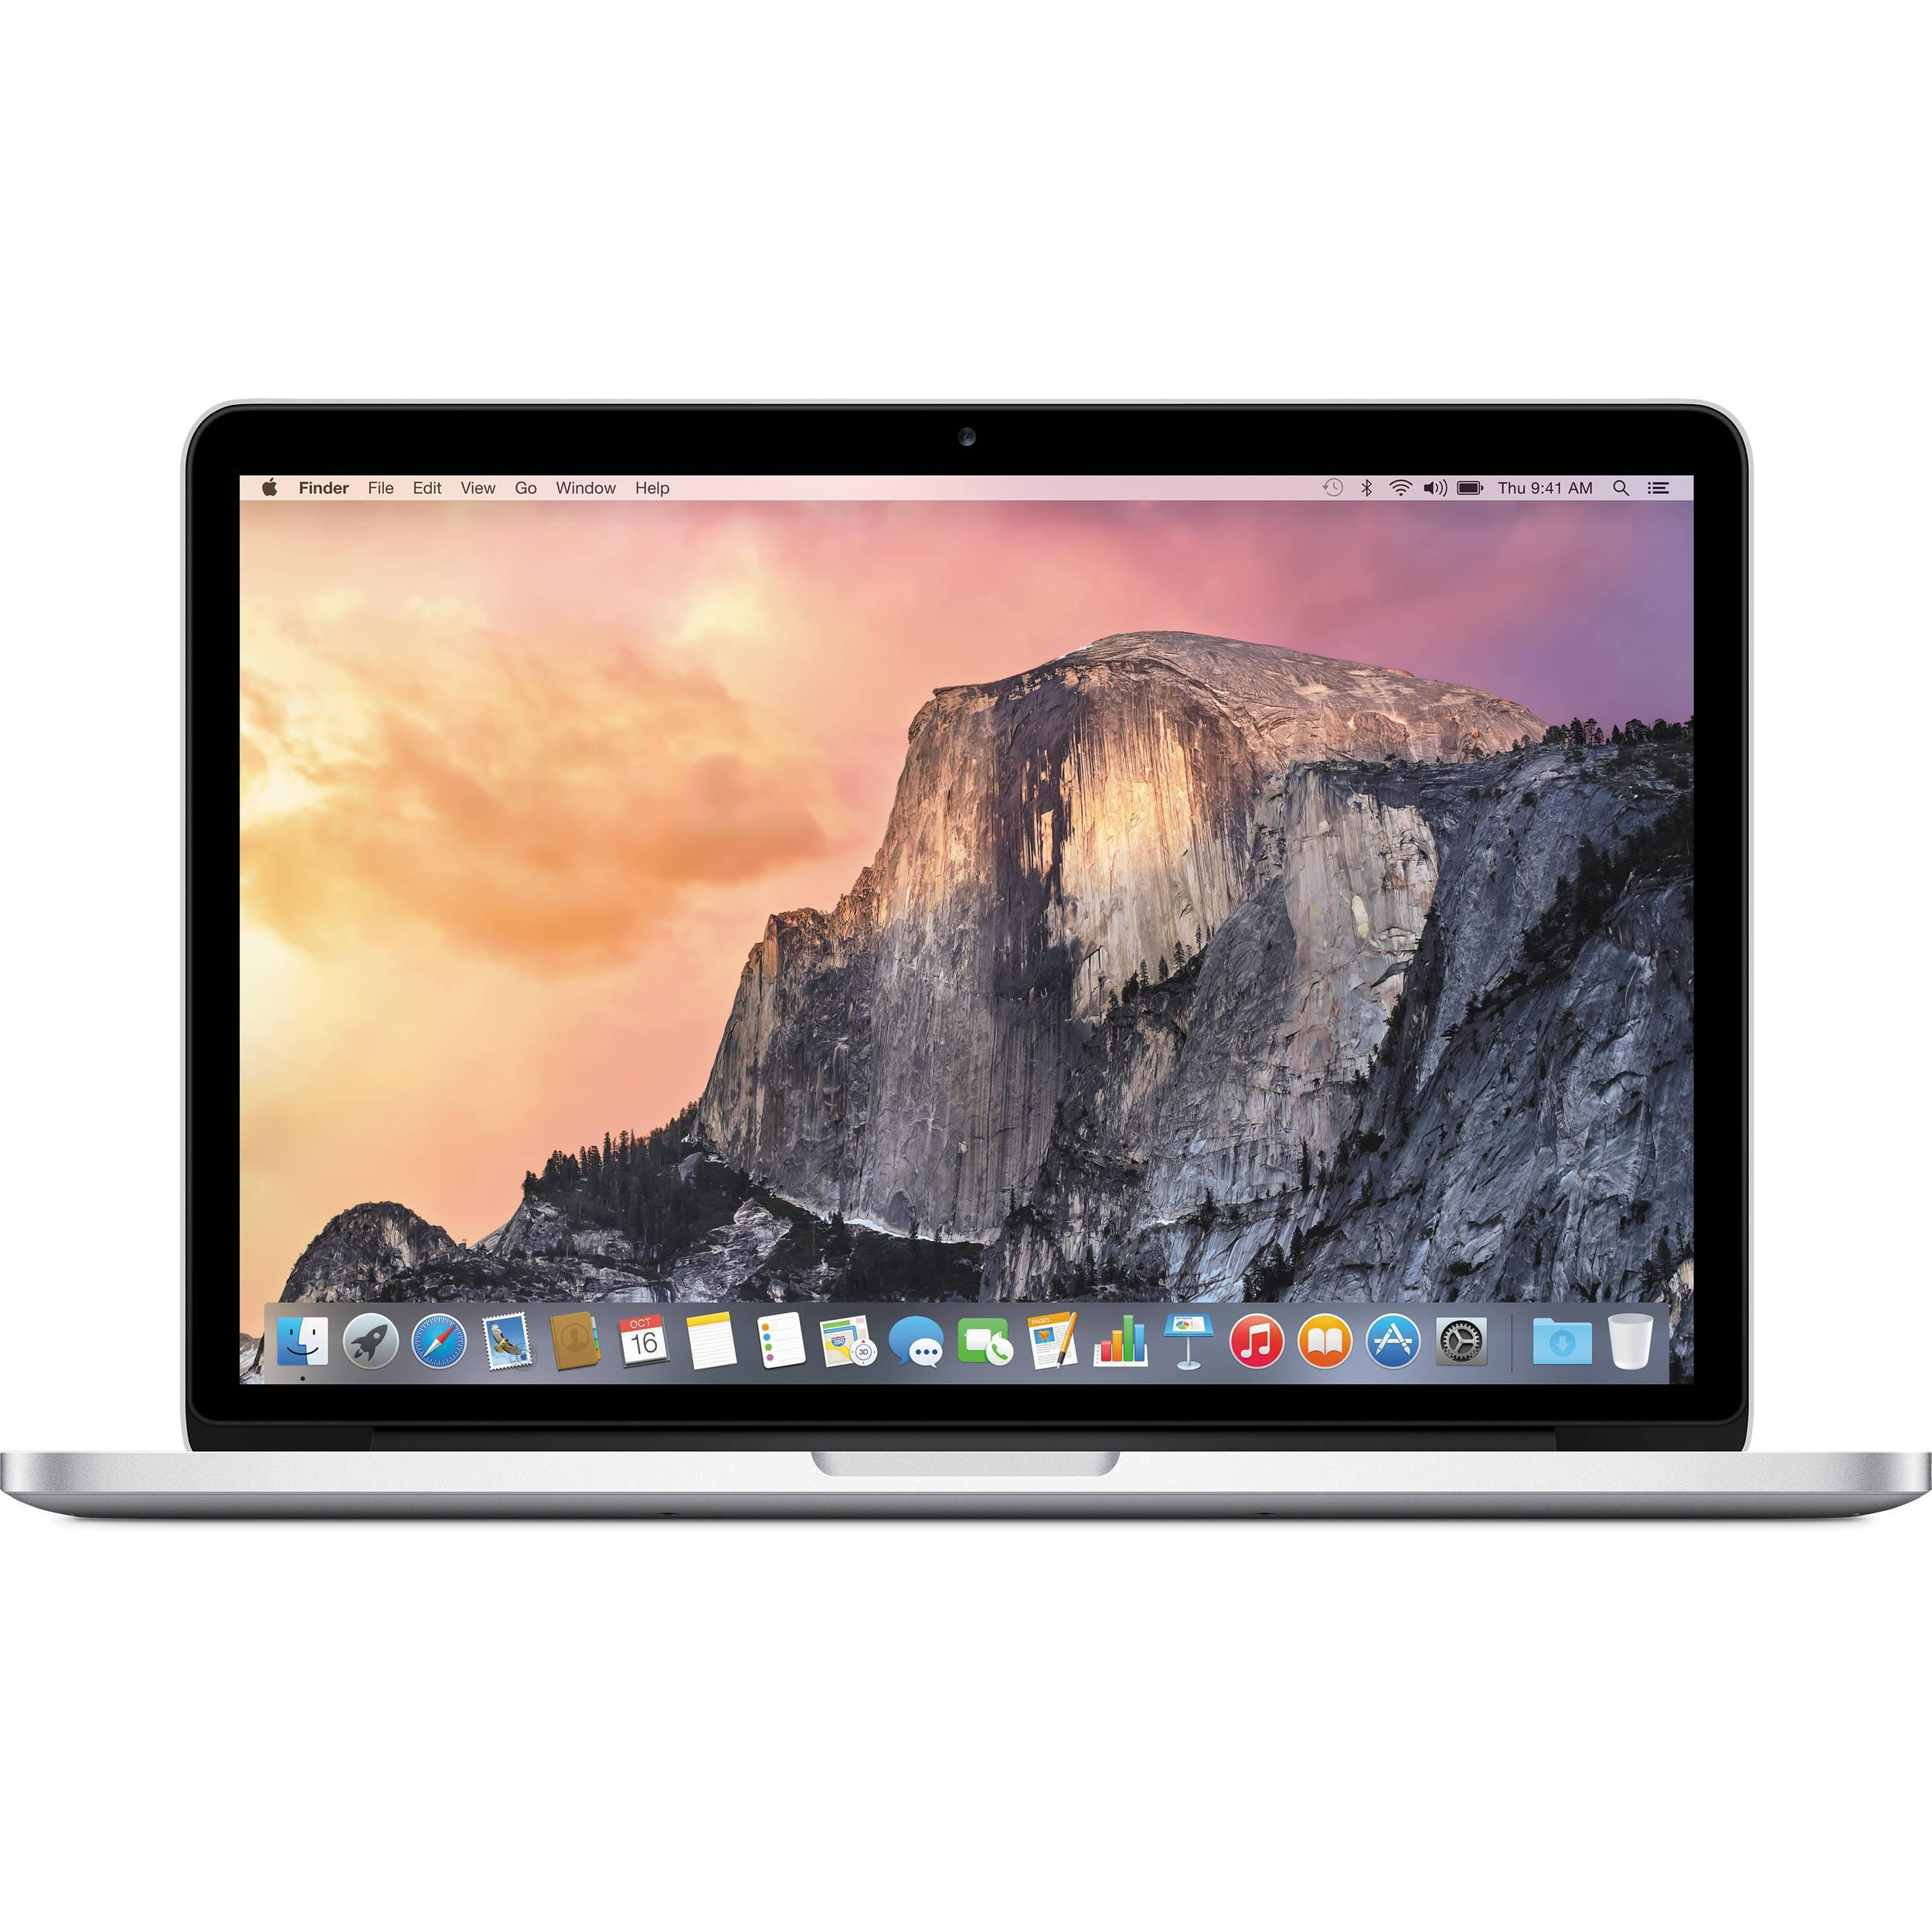 MacBook Pro Retina 13,3-inch (2014) - Core i5 - 8GB - SSD 128 GB QWERTY - Inglês (EUA)